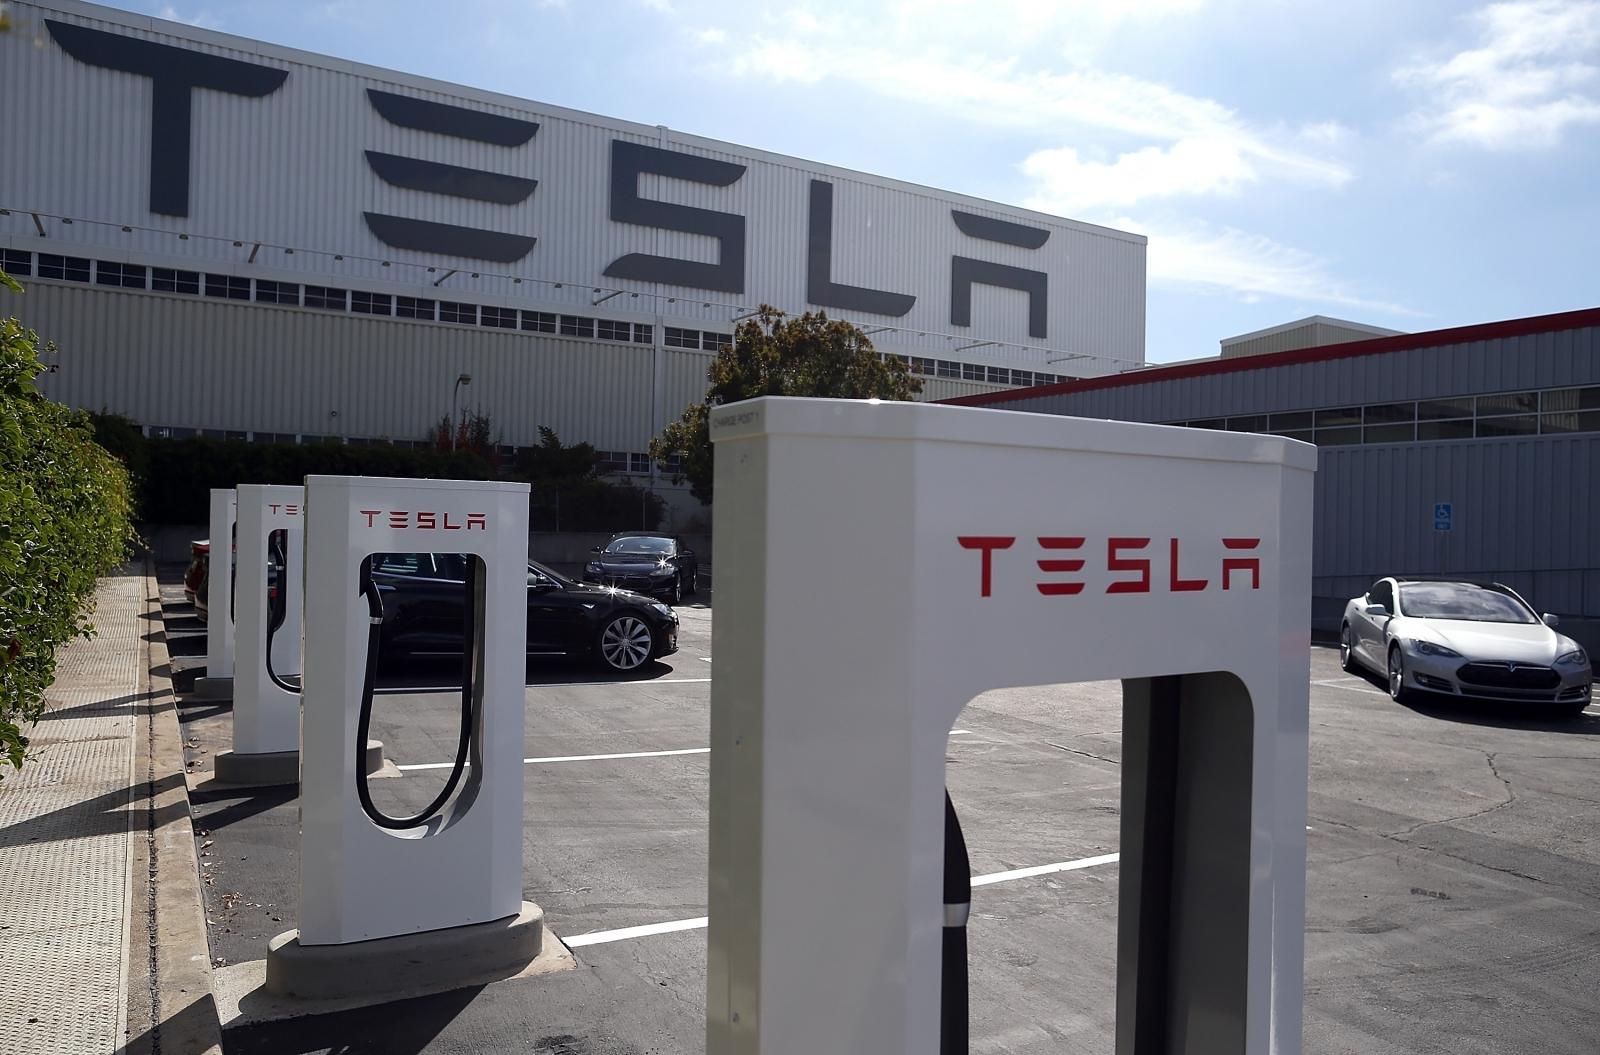 Tesla Fremont factory logo